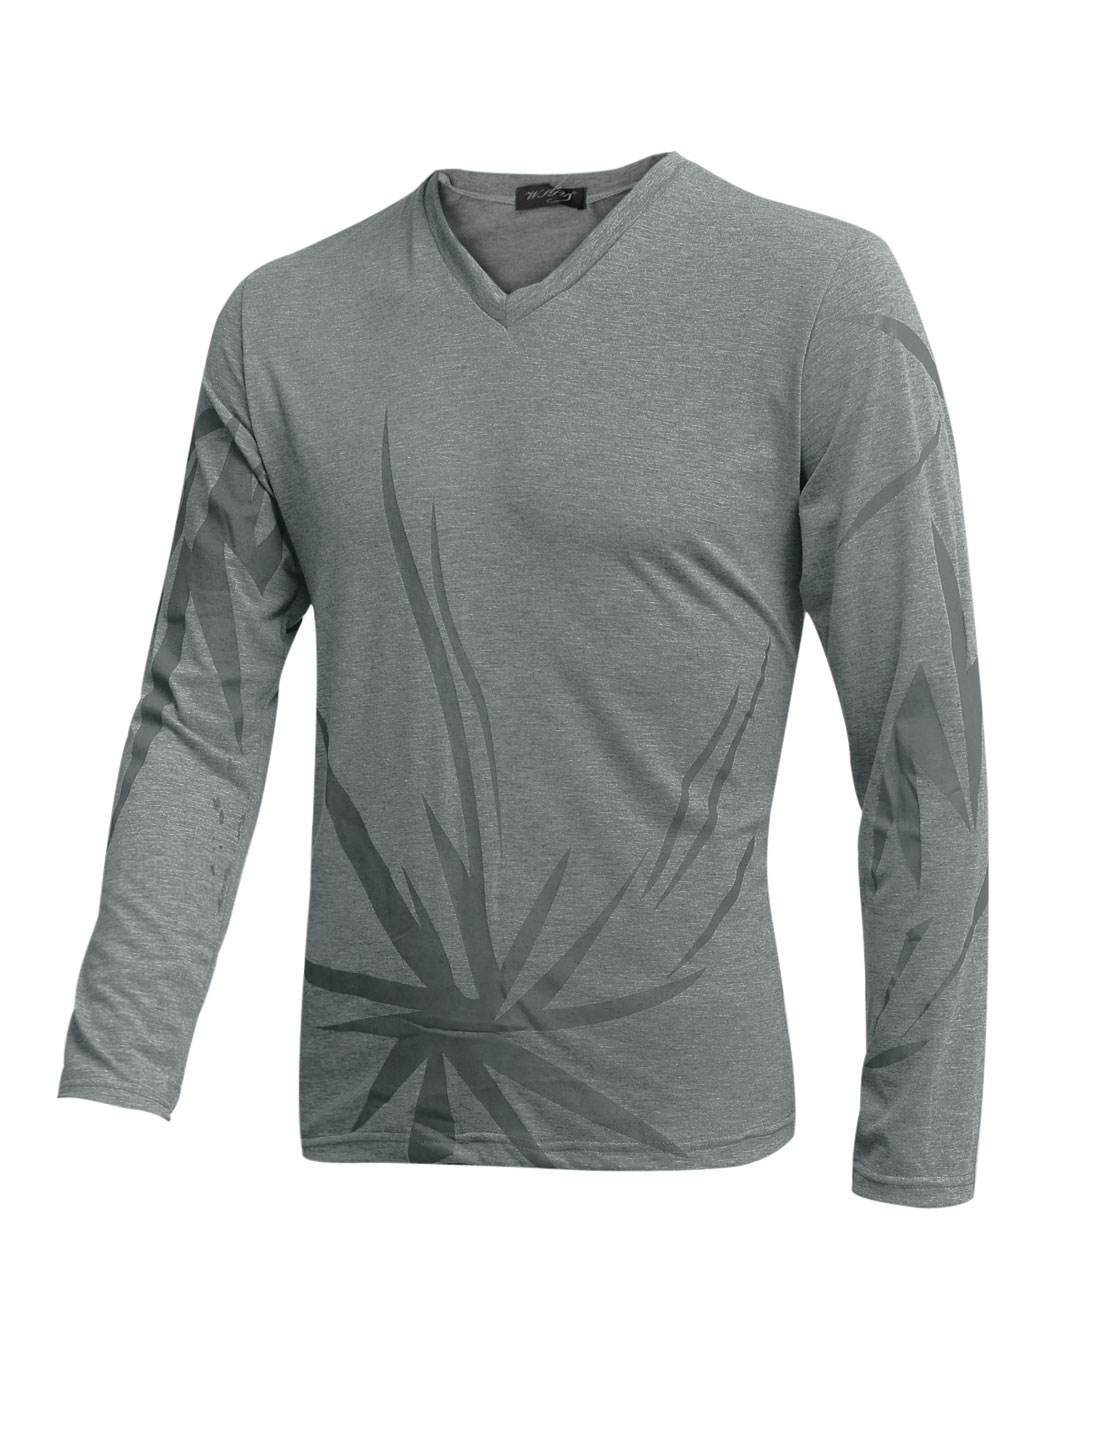 Men V Neck Long Sleeves Novelty Print Cozy Fit T-Shirt Dark Gray M